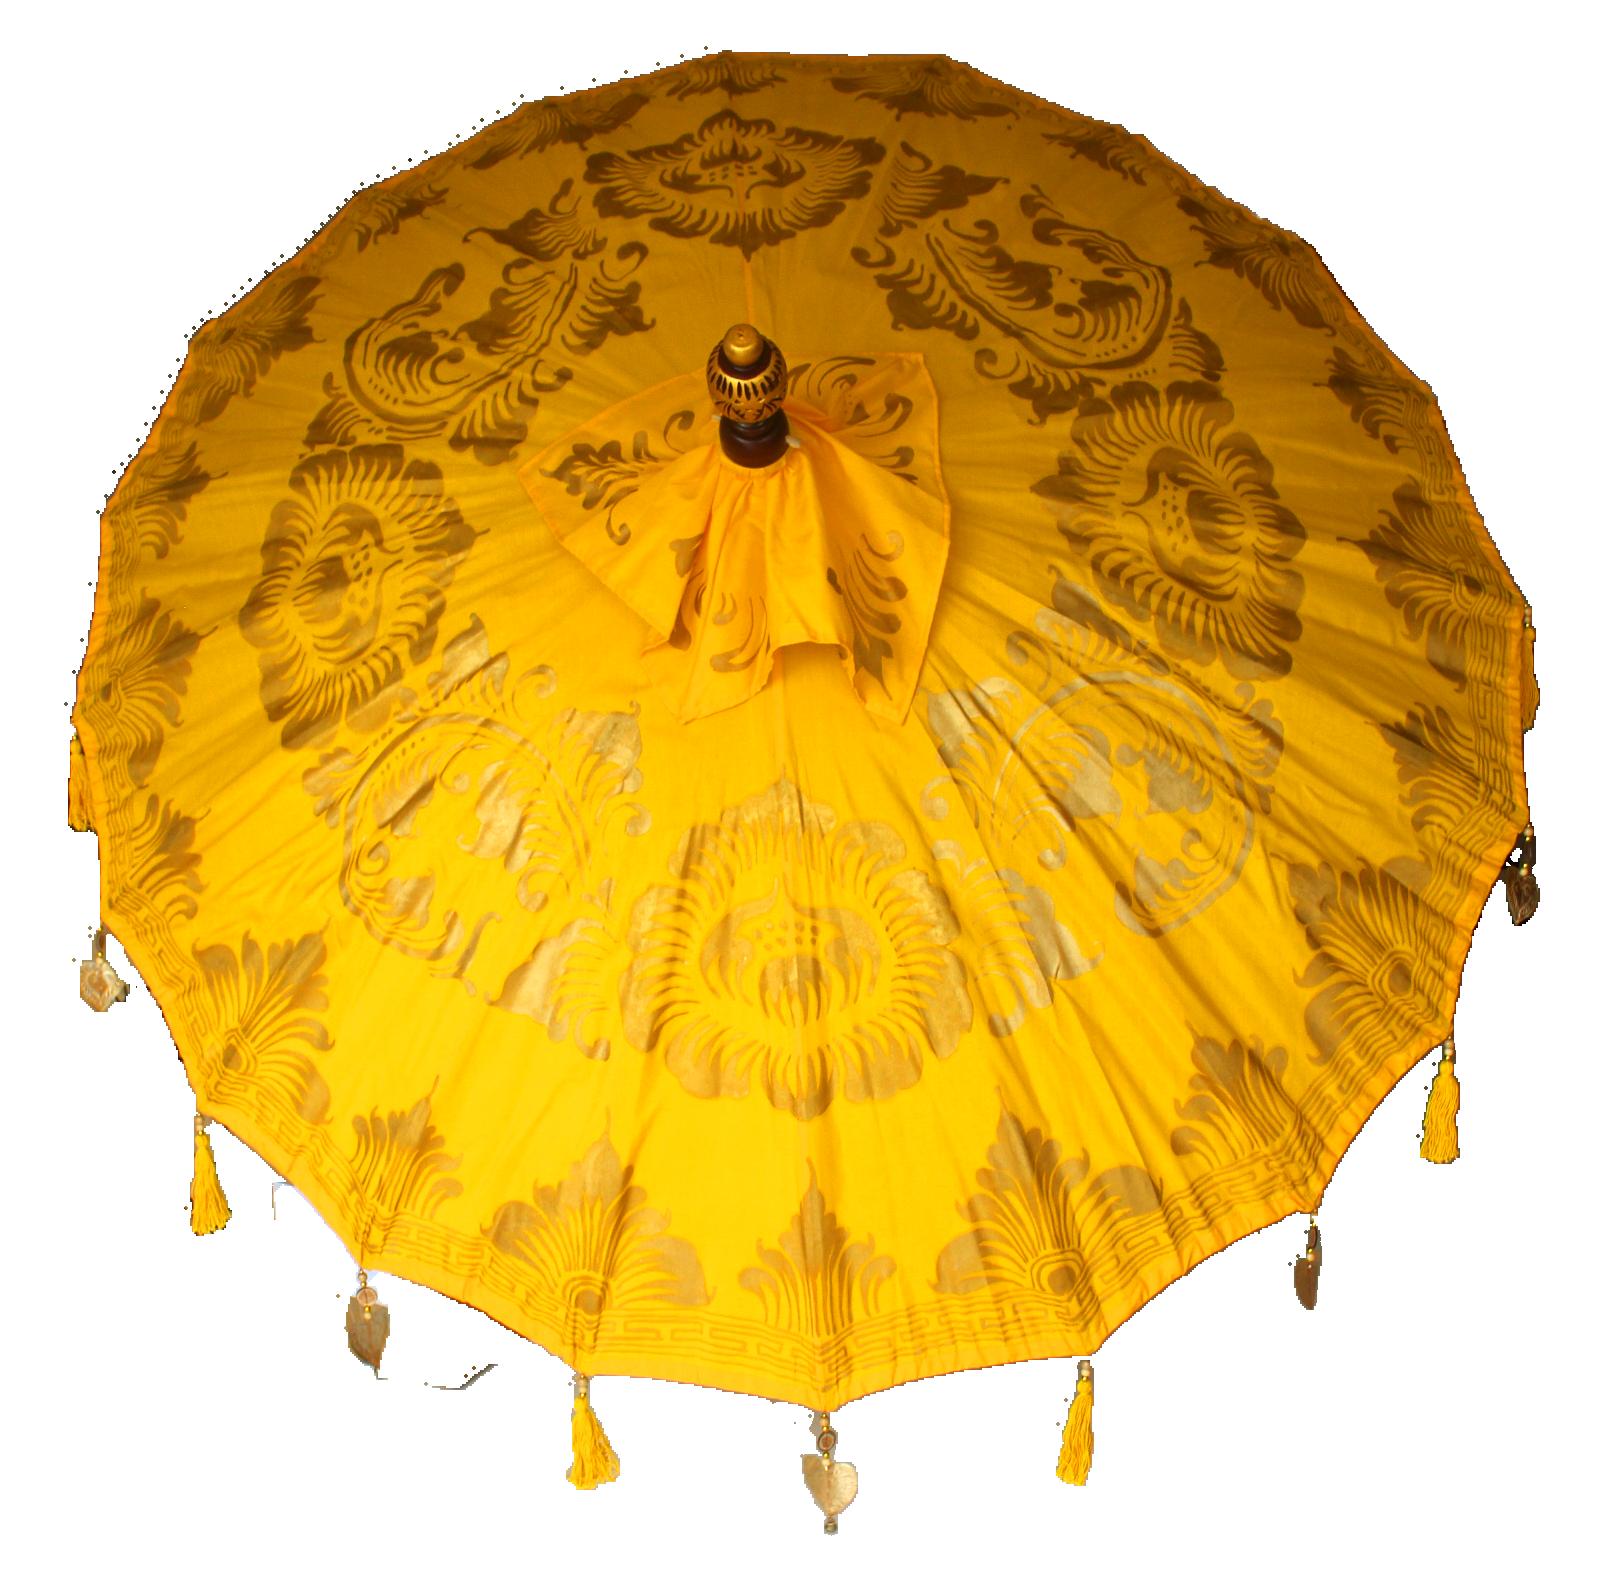 Balinese Umbrella #oriental #bali #balinese #parasol #umbrella #prophire #poolstyling